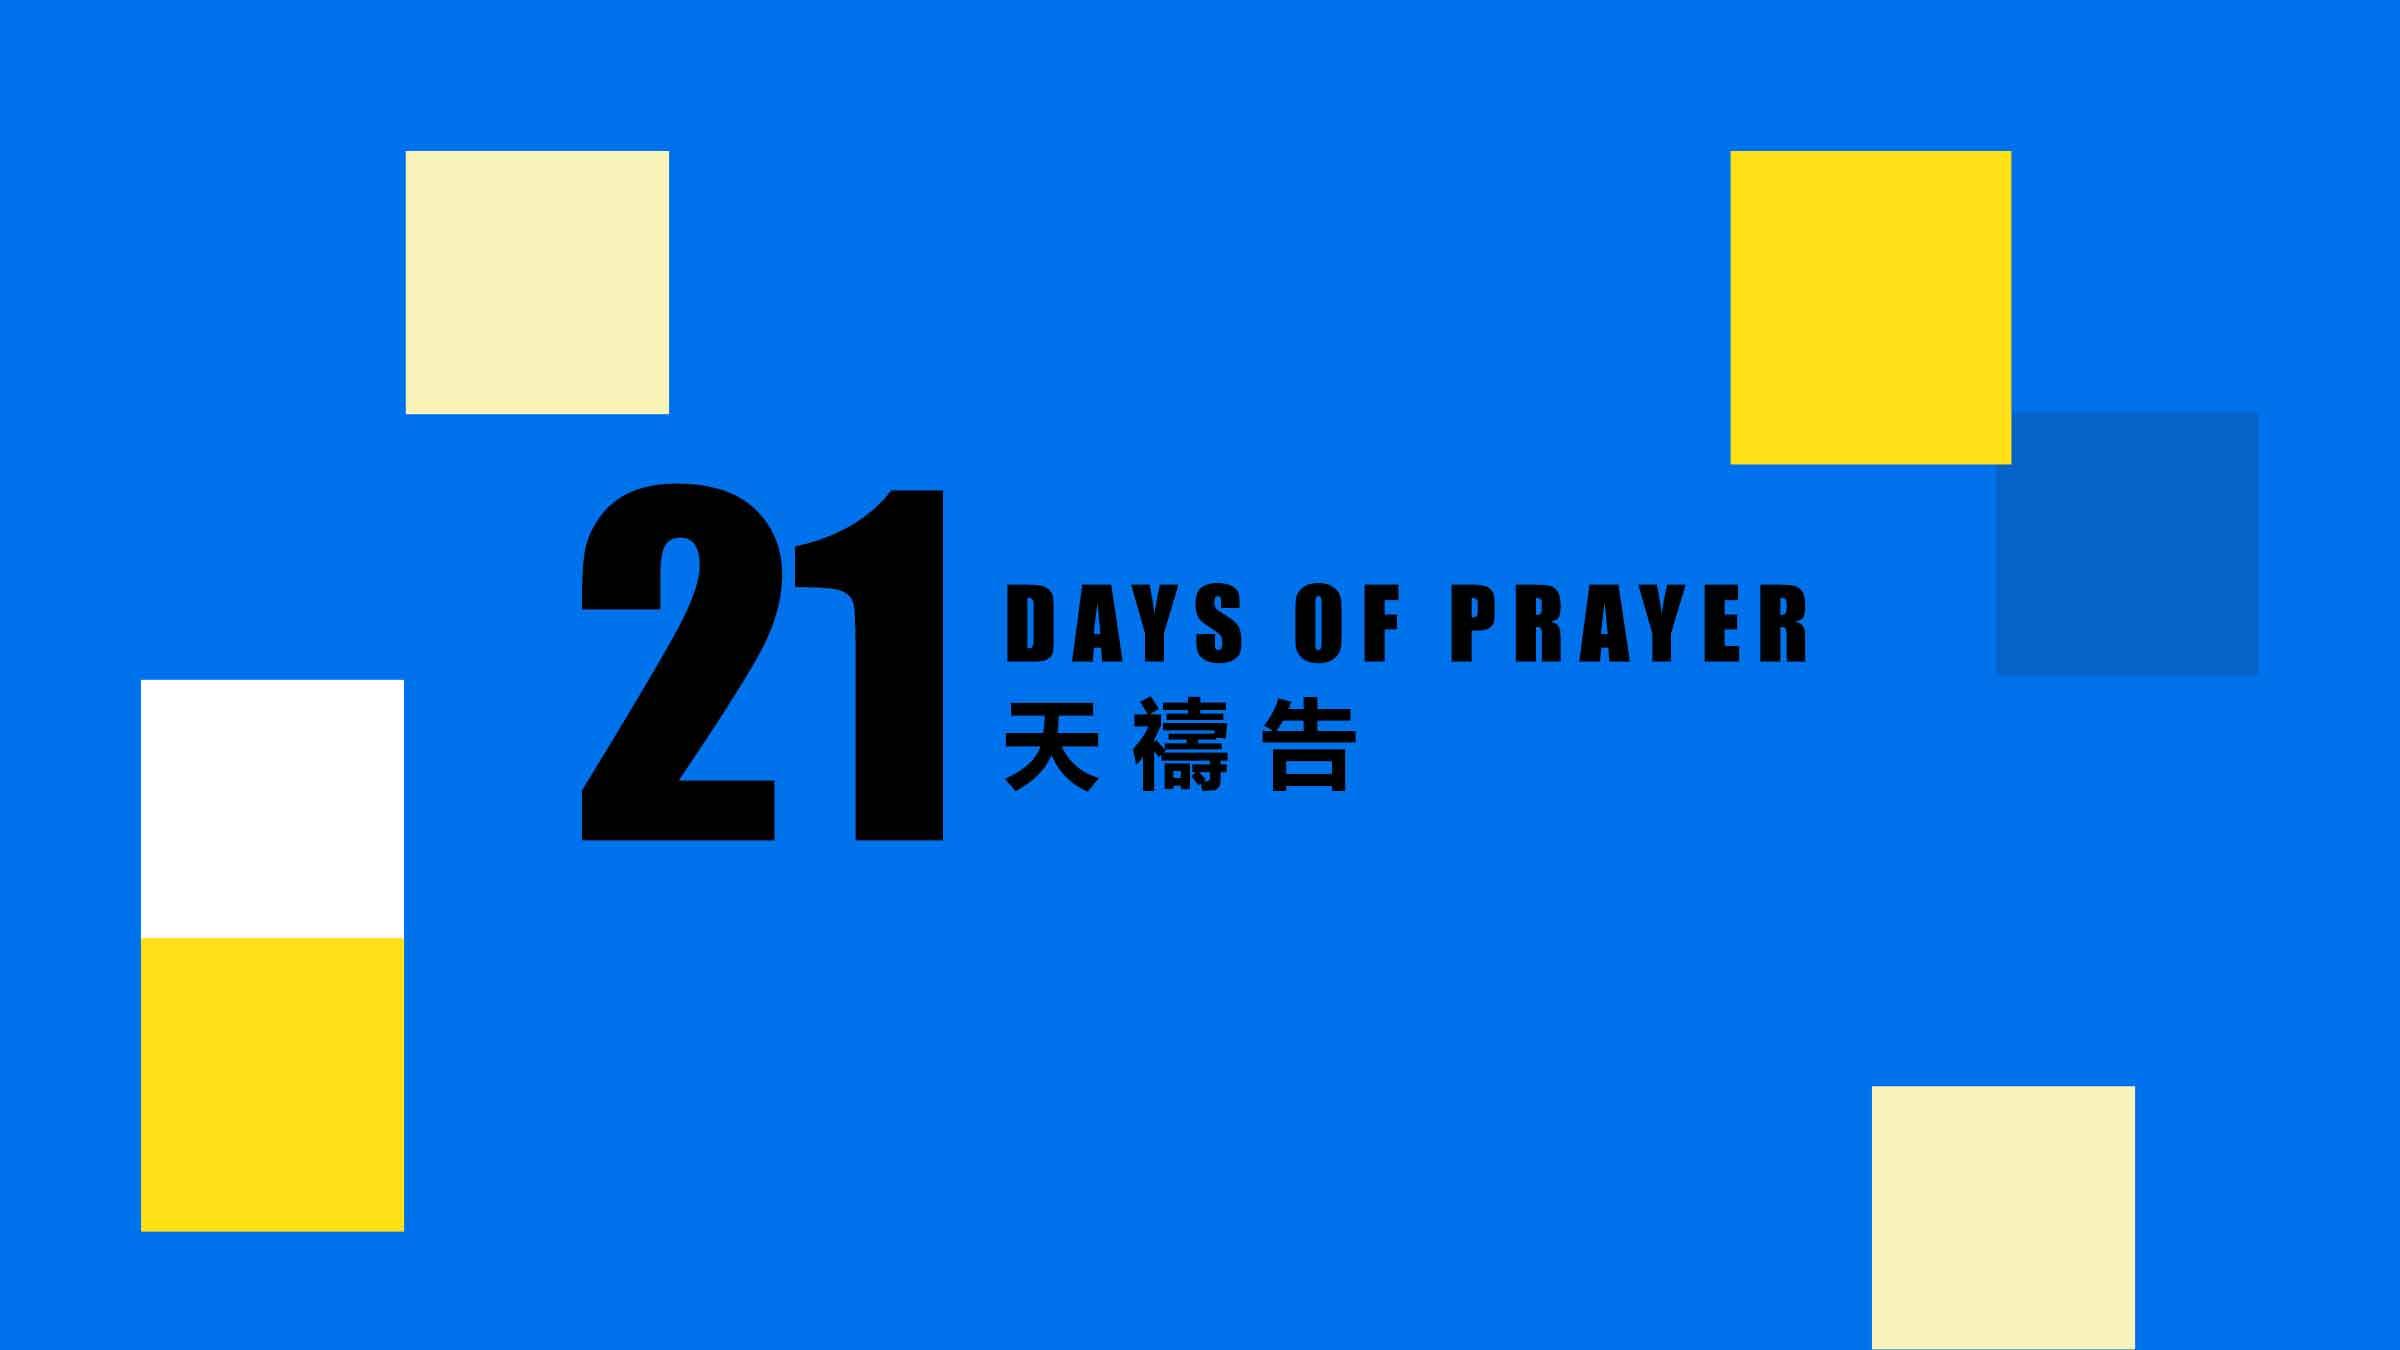 21-Days-of-Prayer-2021-Aug---Title